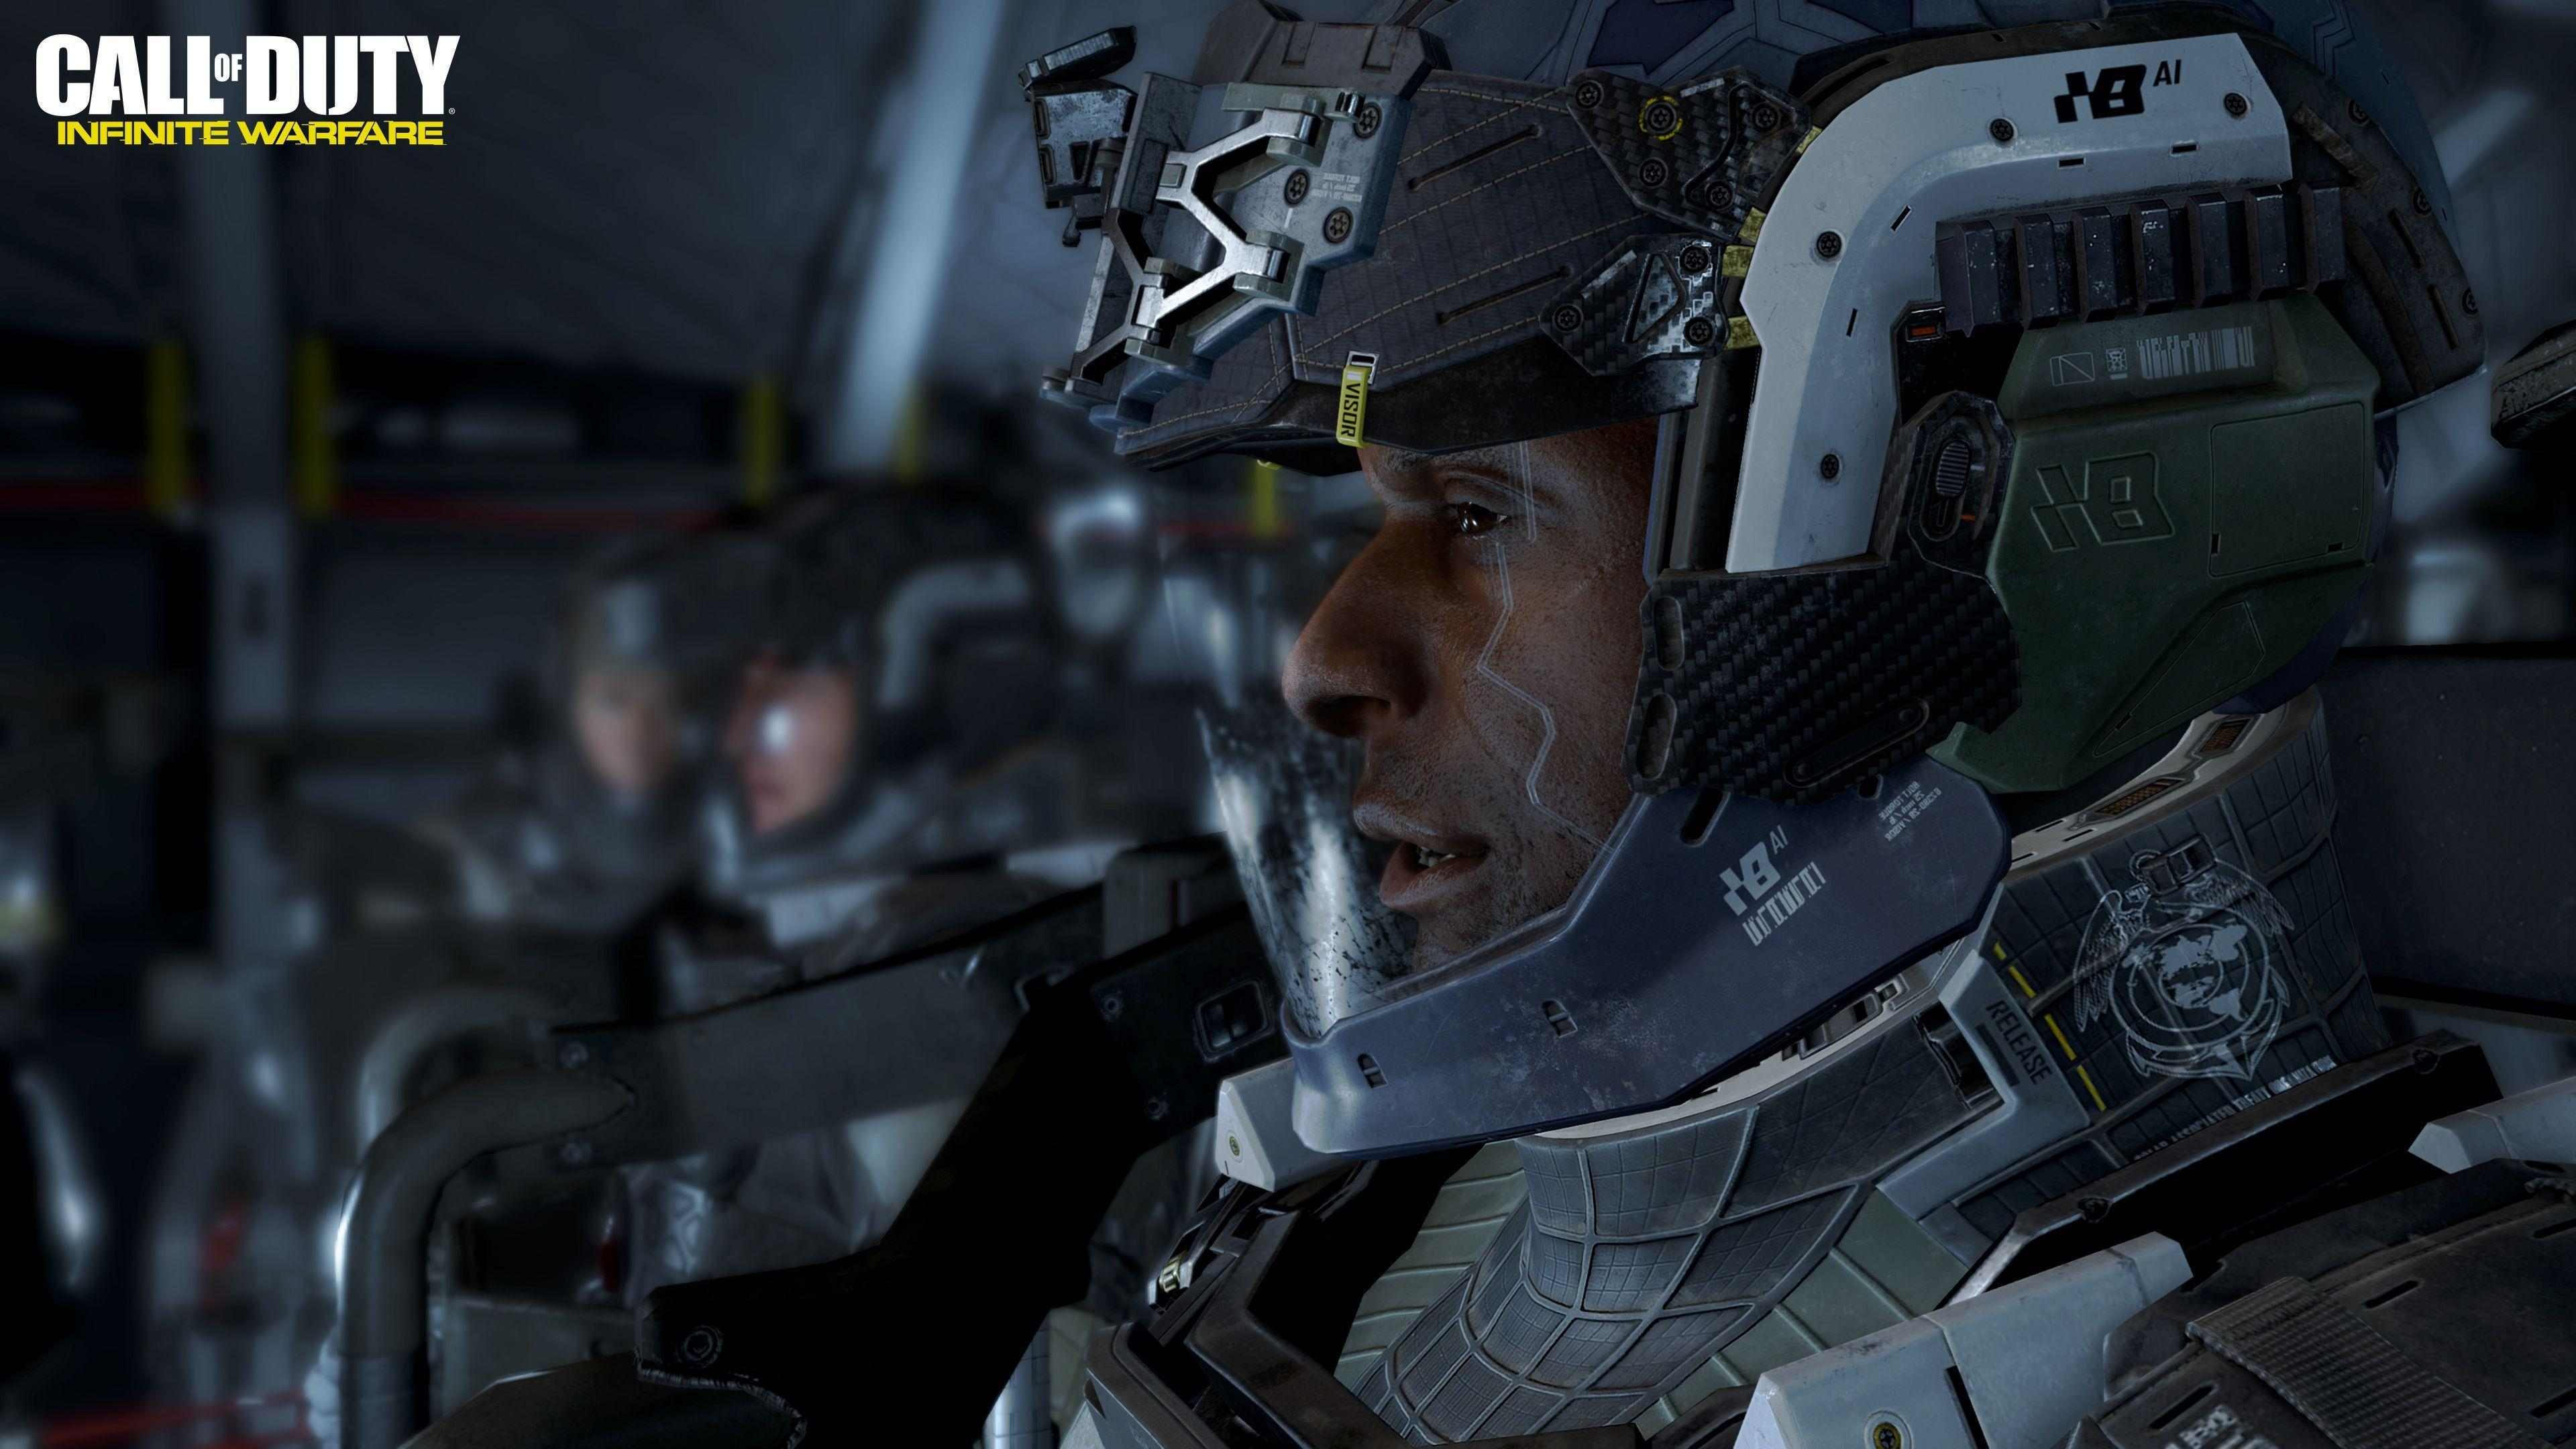 Call Of Duty: Infinite Warfare Wallpapers - Wallpaper Cave